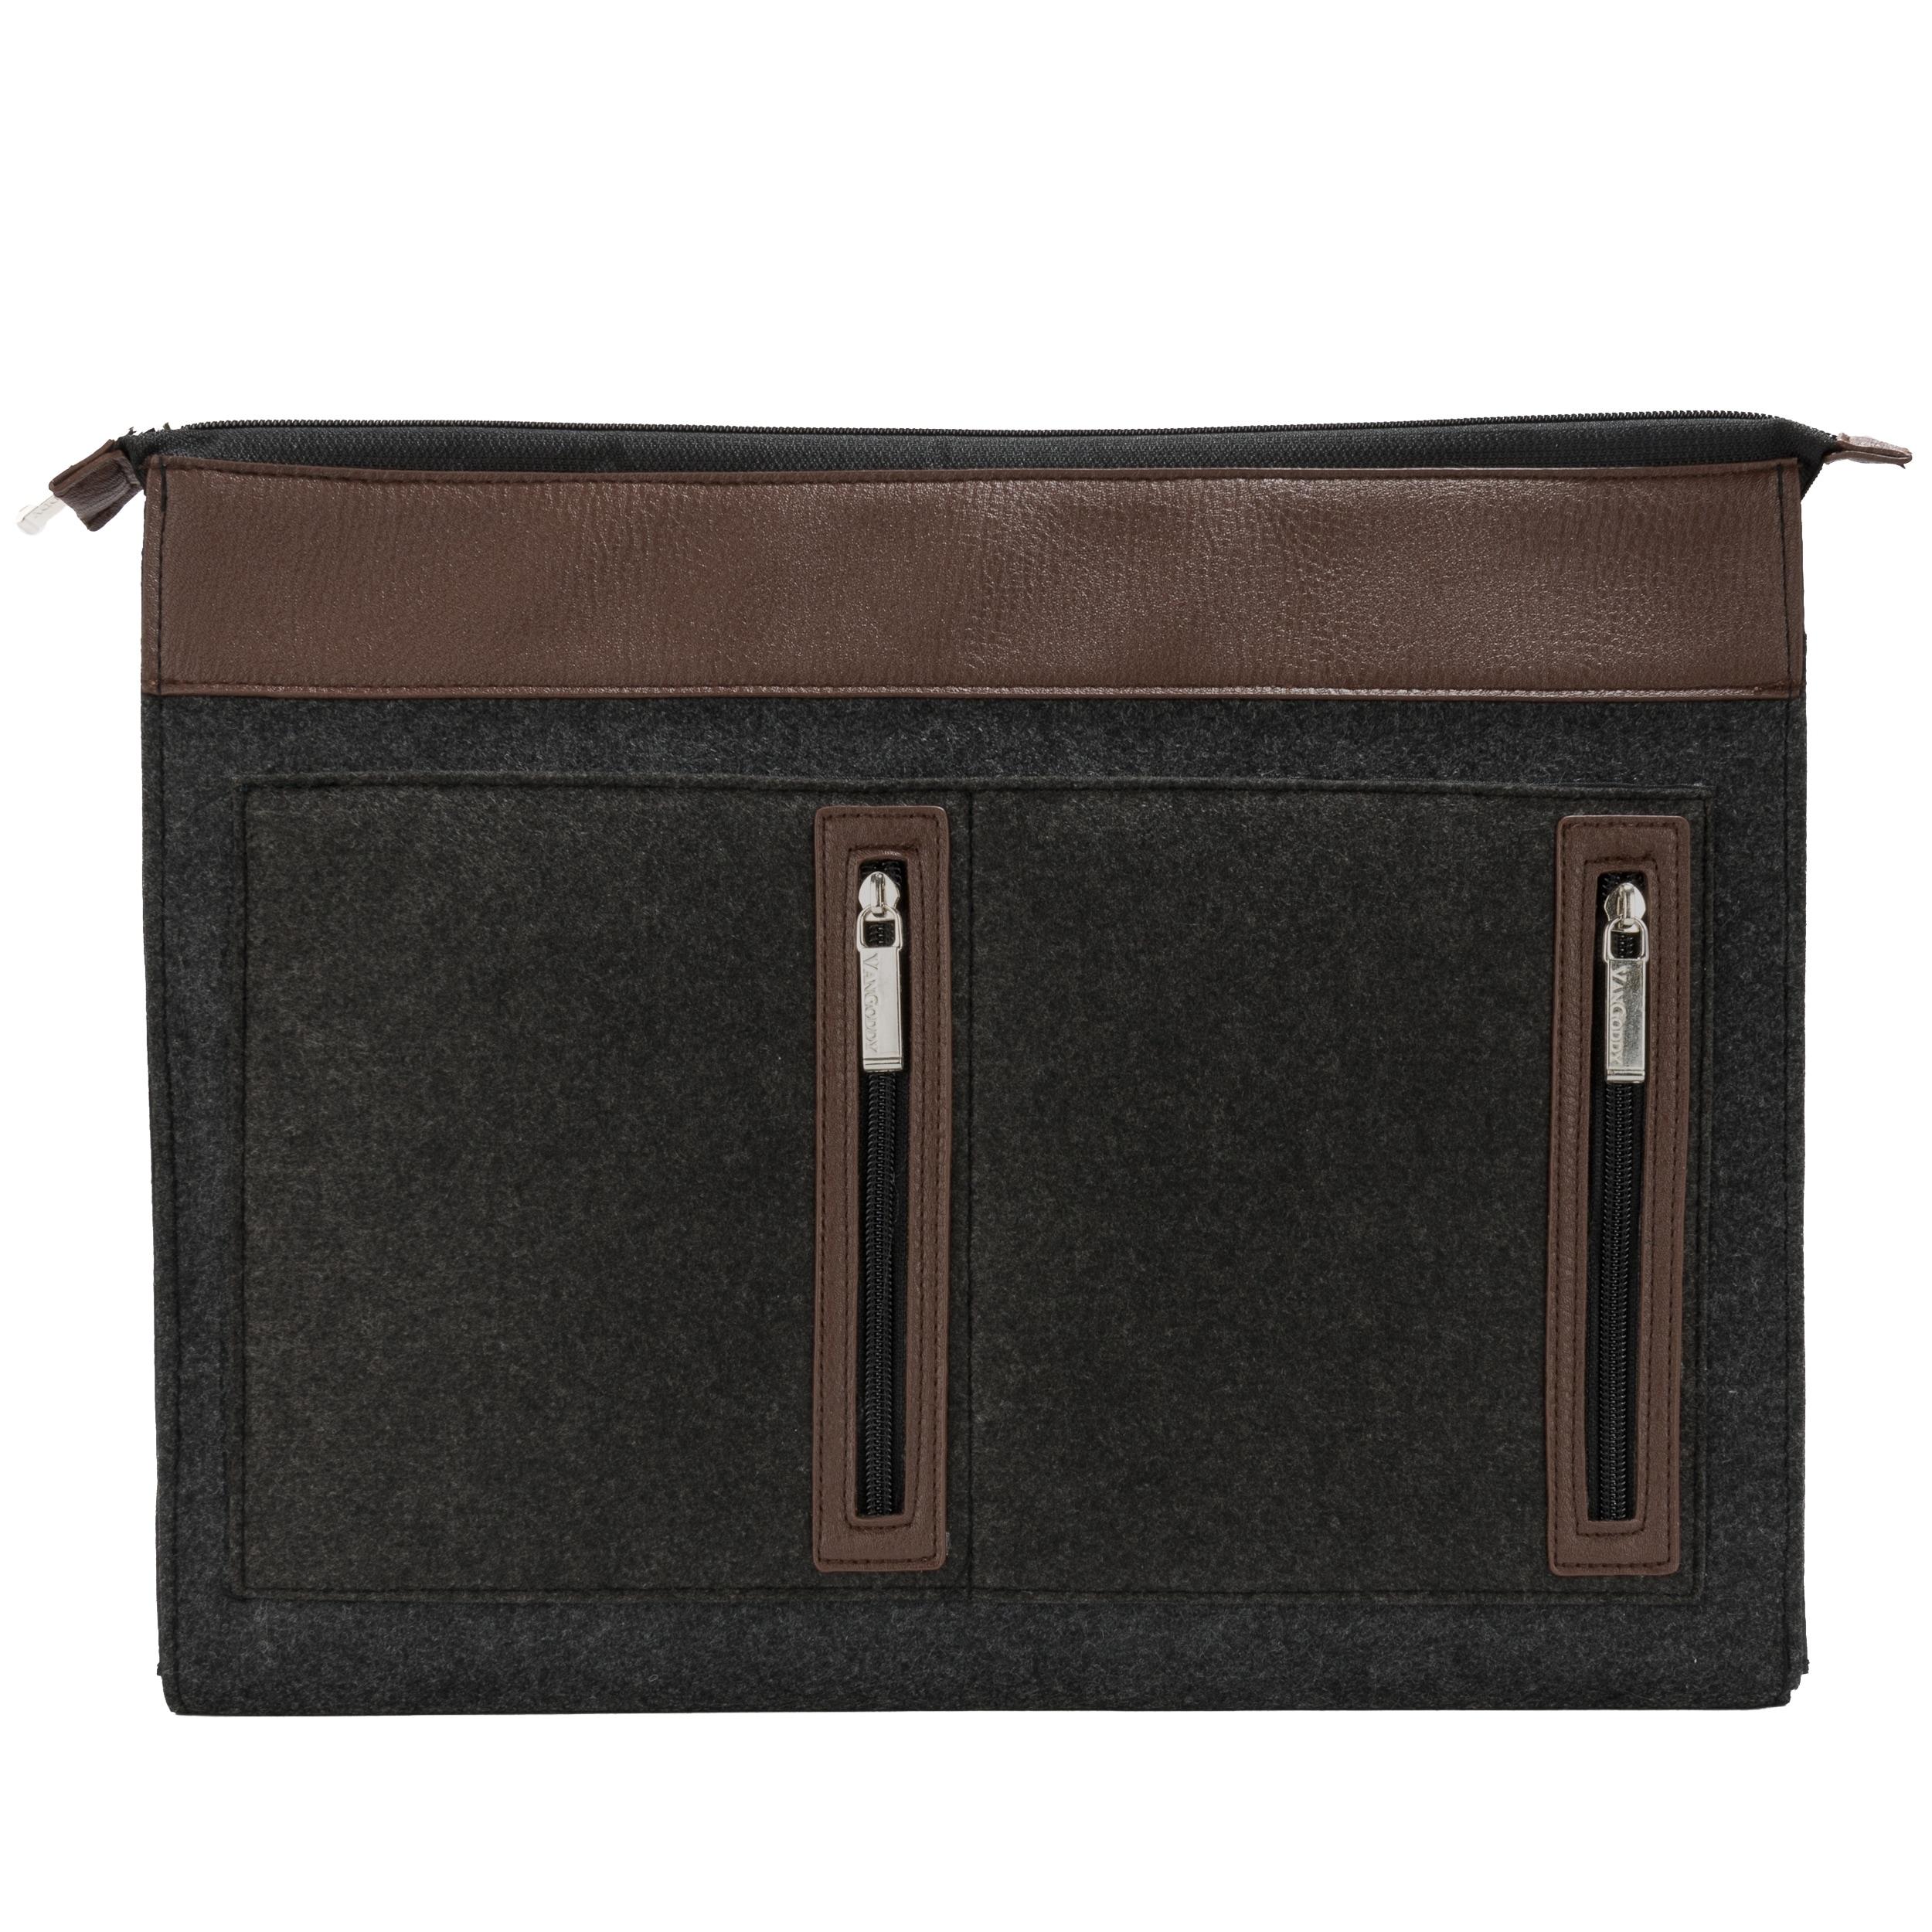 Professional Sleeve Case Laptop Cover for HP Omen 17 Envy 17t Lenovo ThinkPad